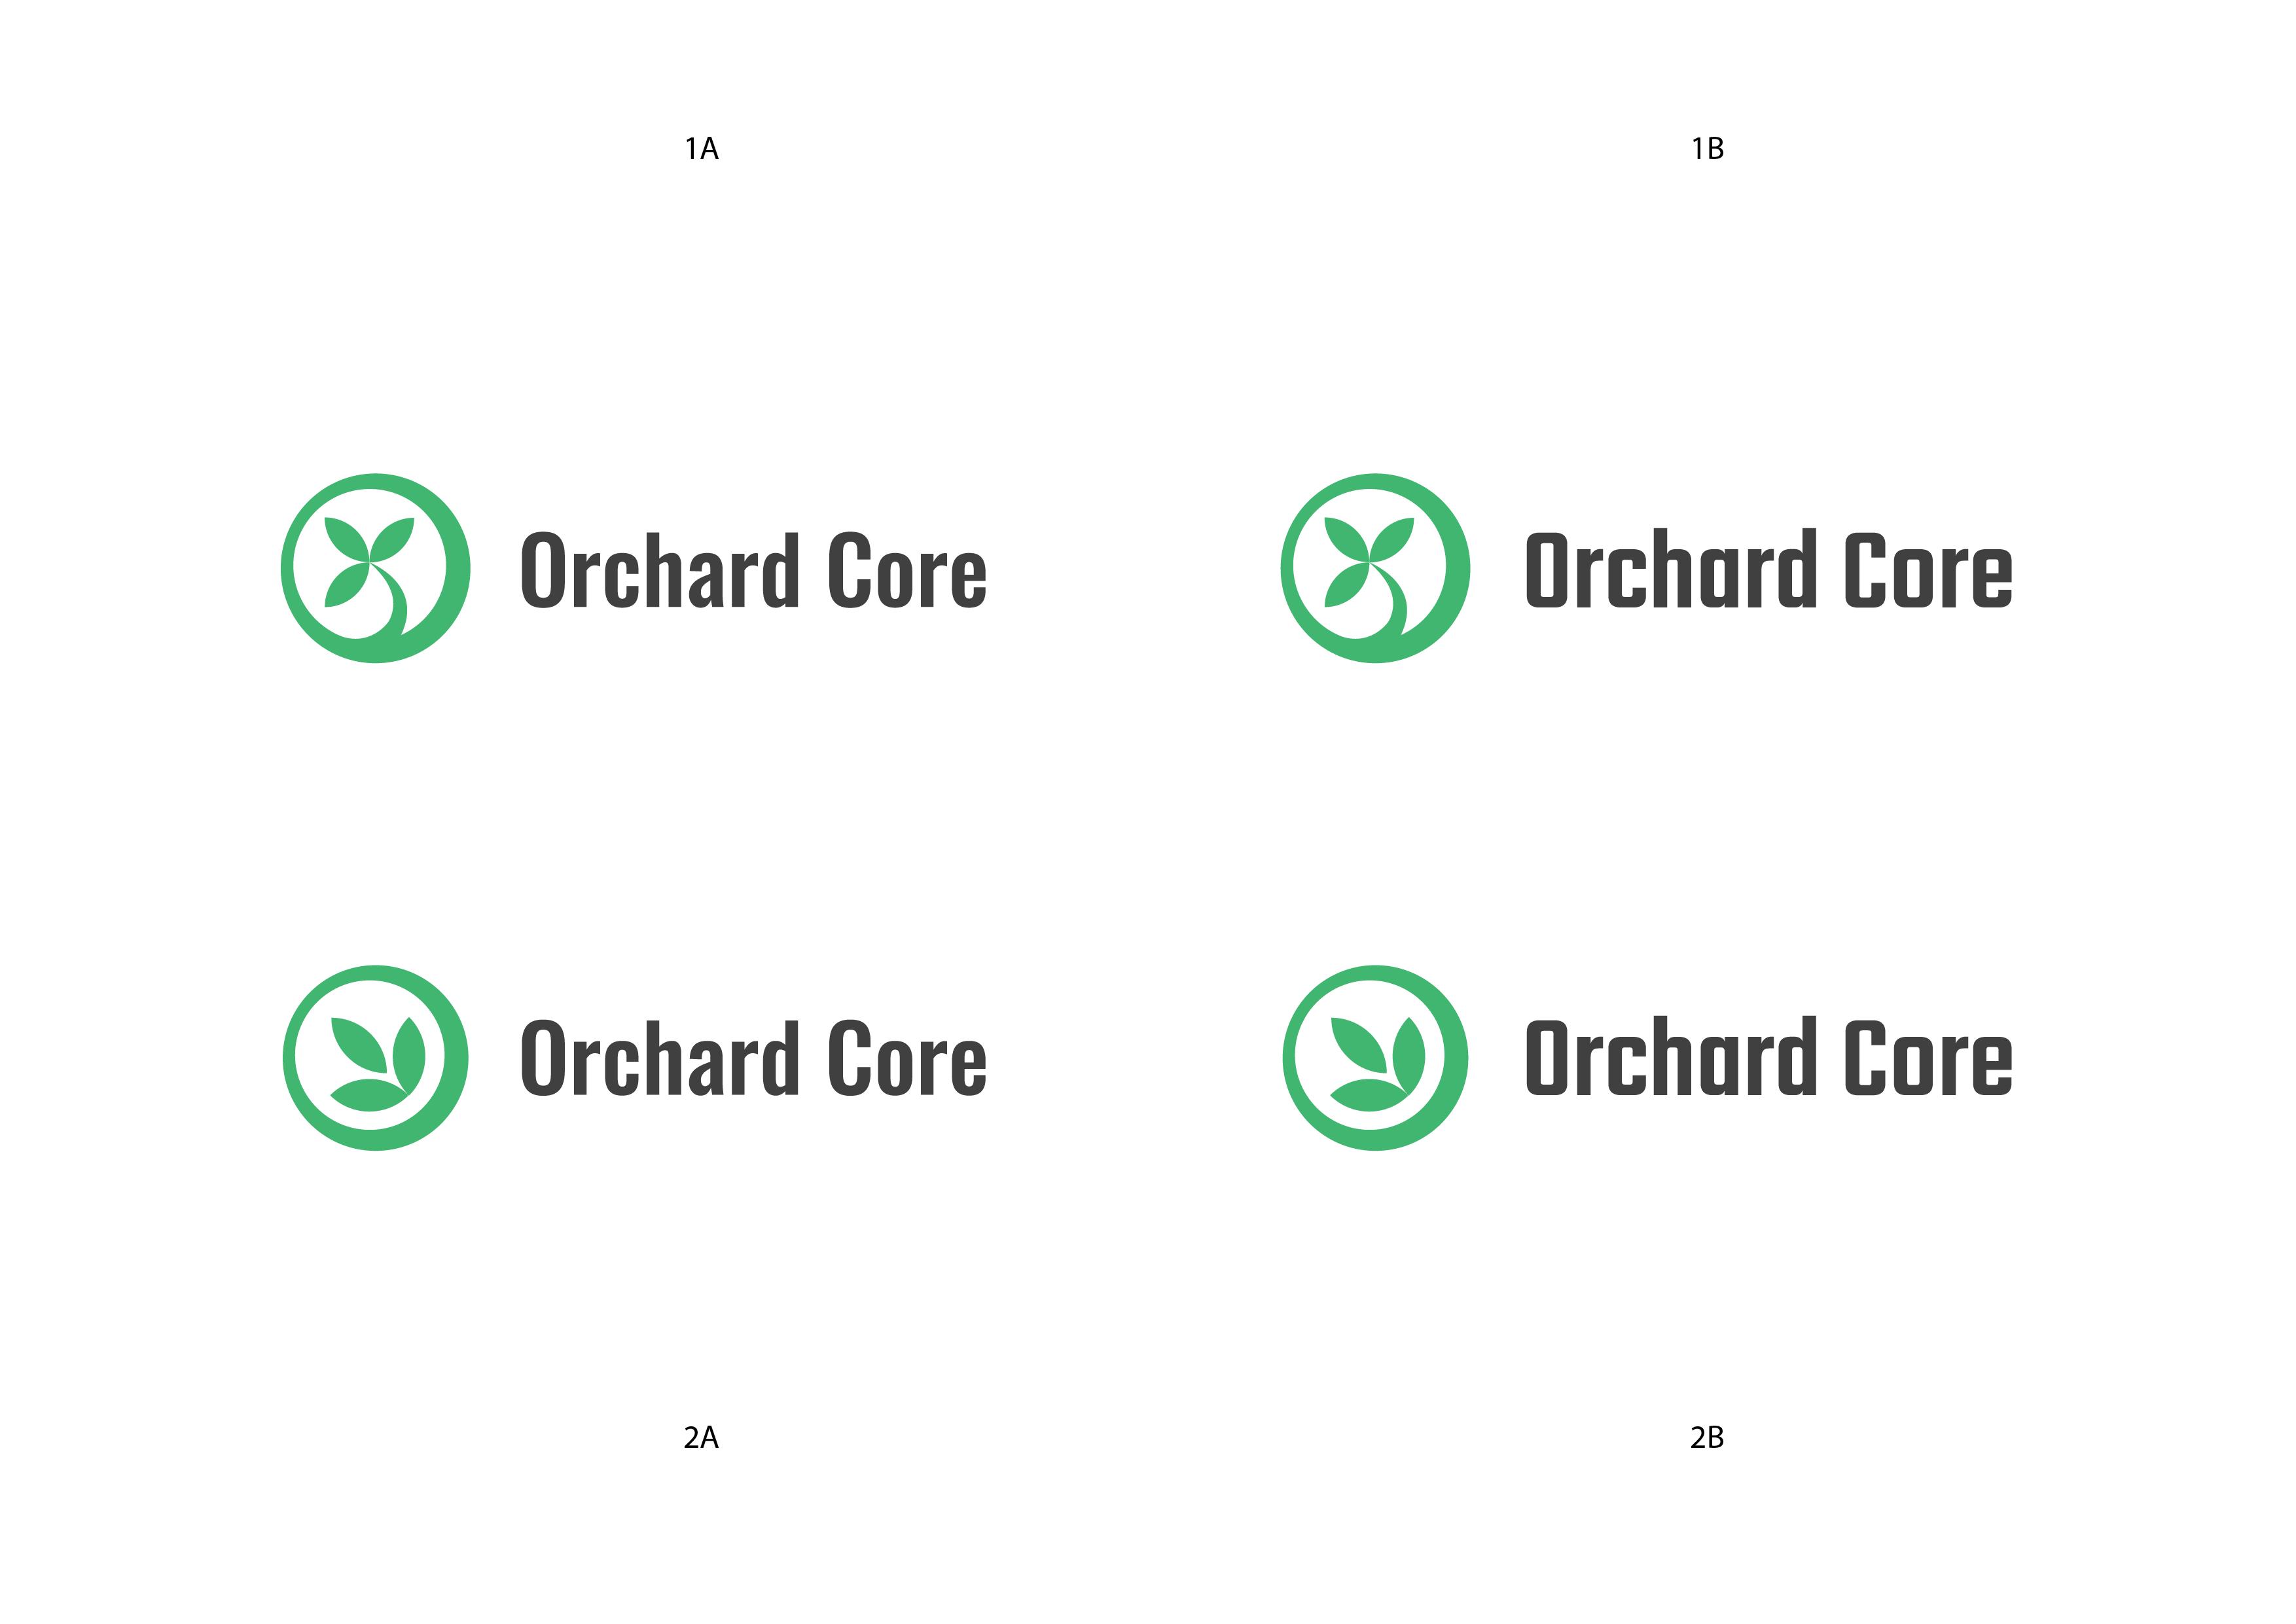 Orchard Core logos